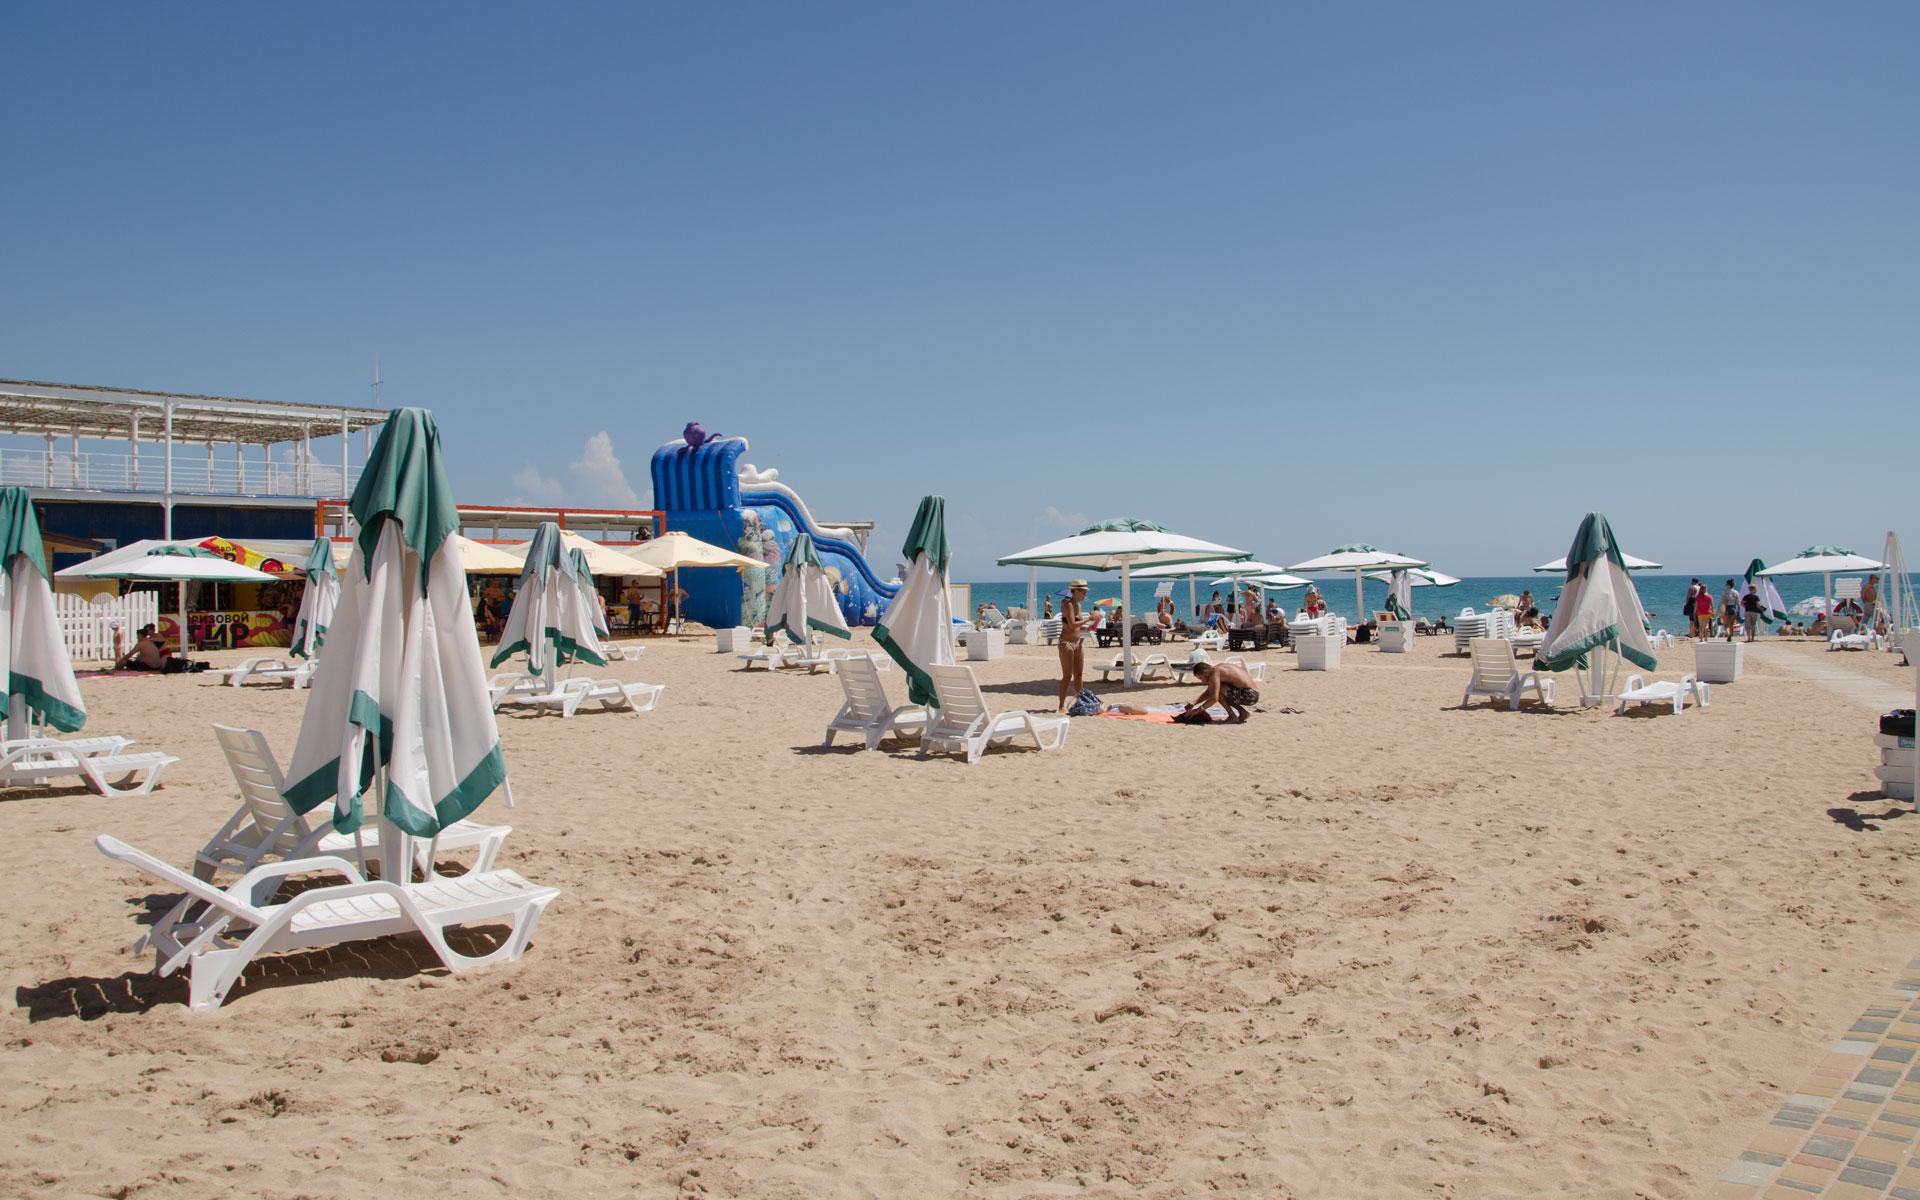 Зонтики с лежаками на пляже. Фото Евпатории